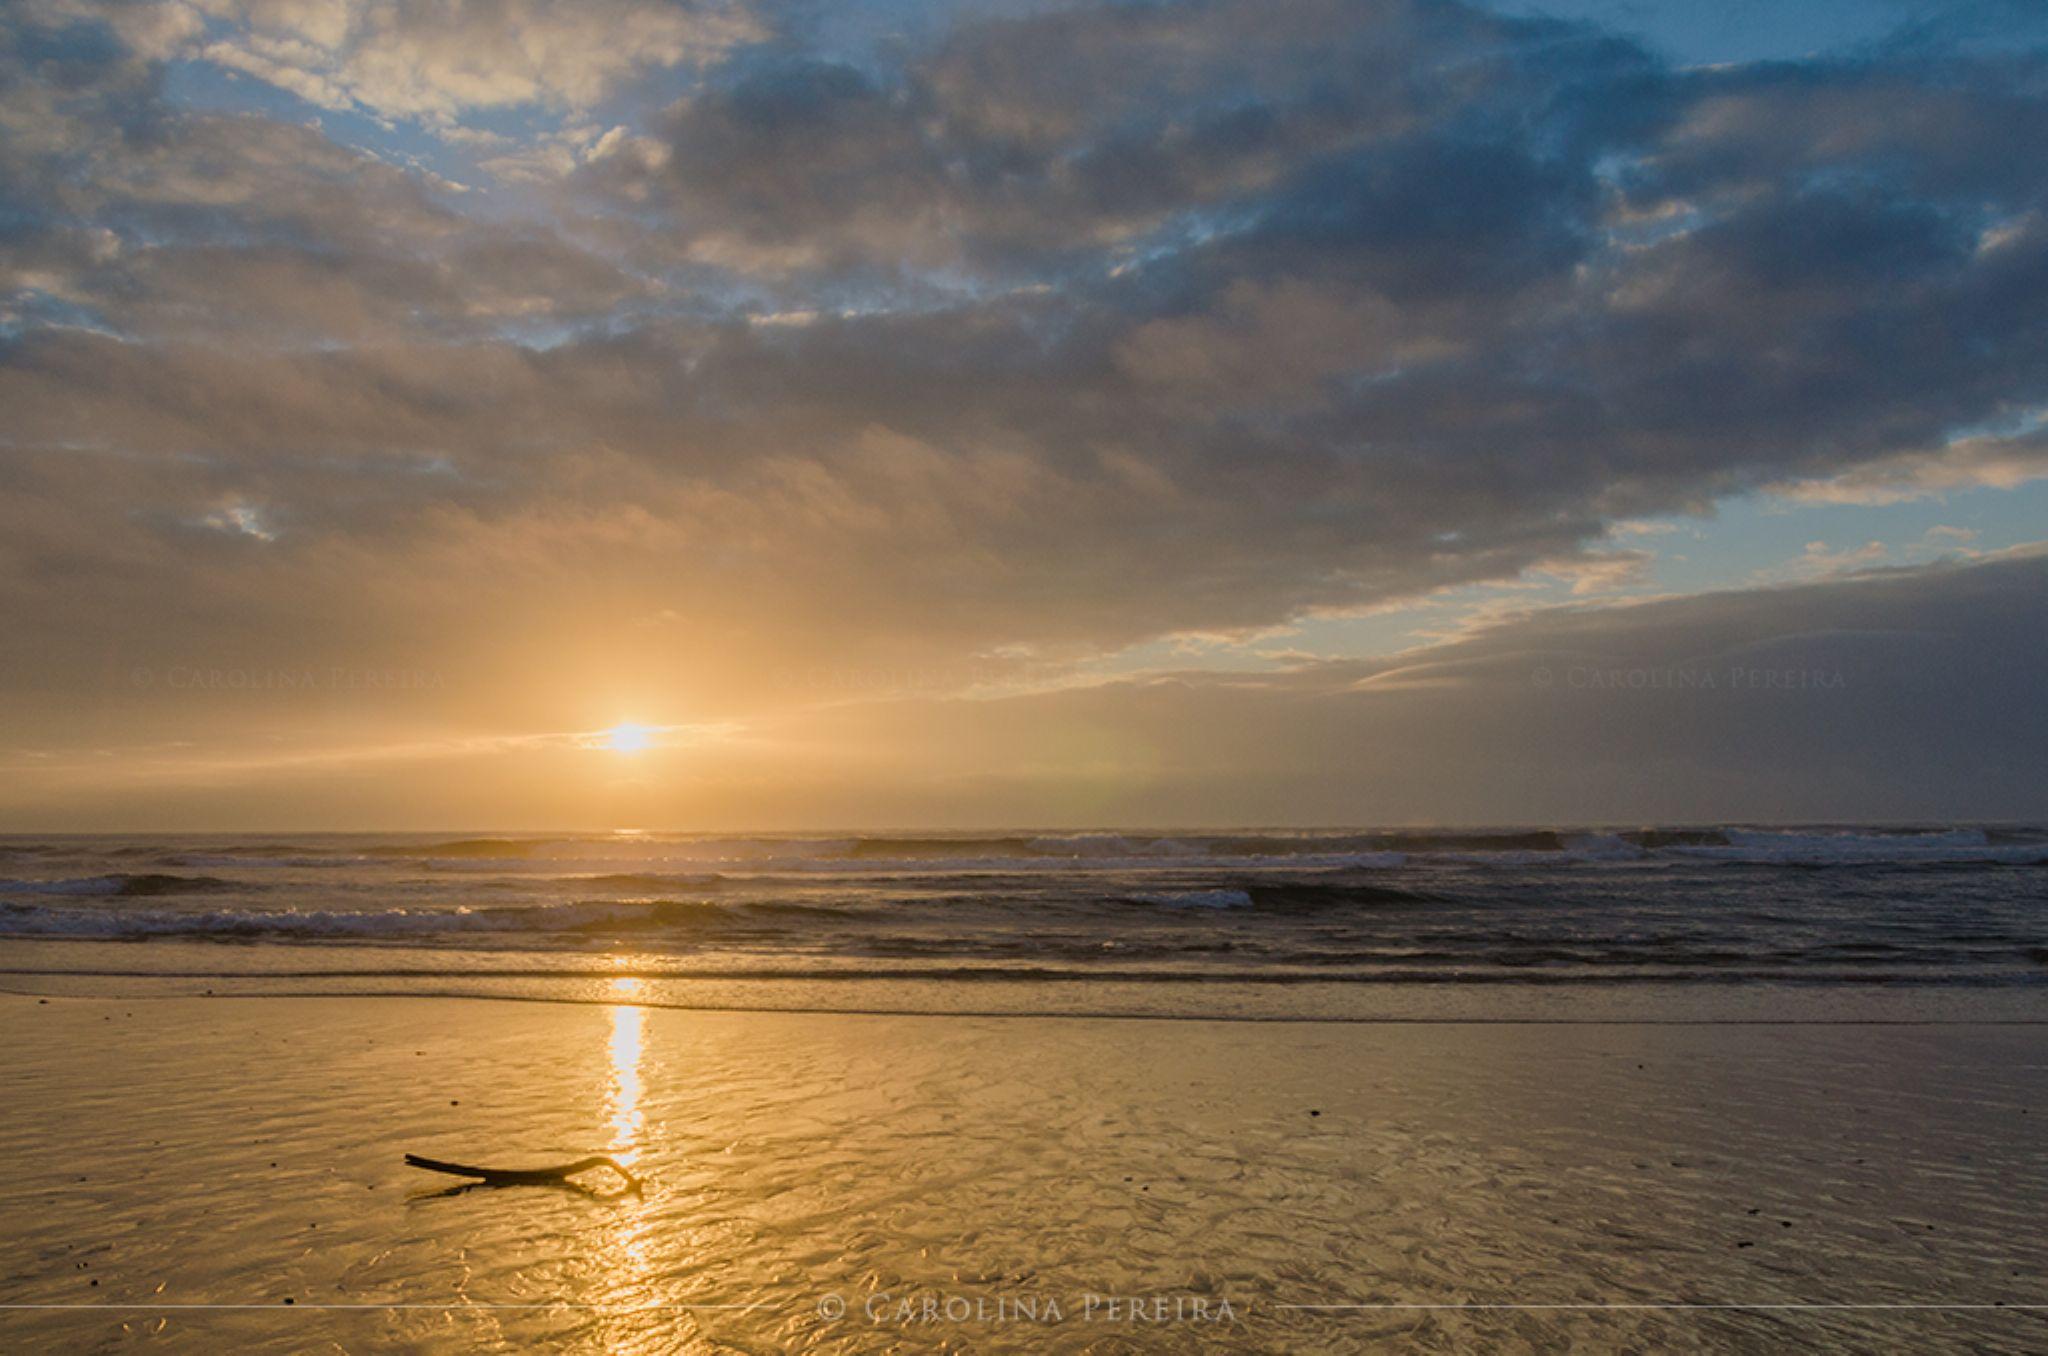 Bright Sunset by Carolina Pereira